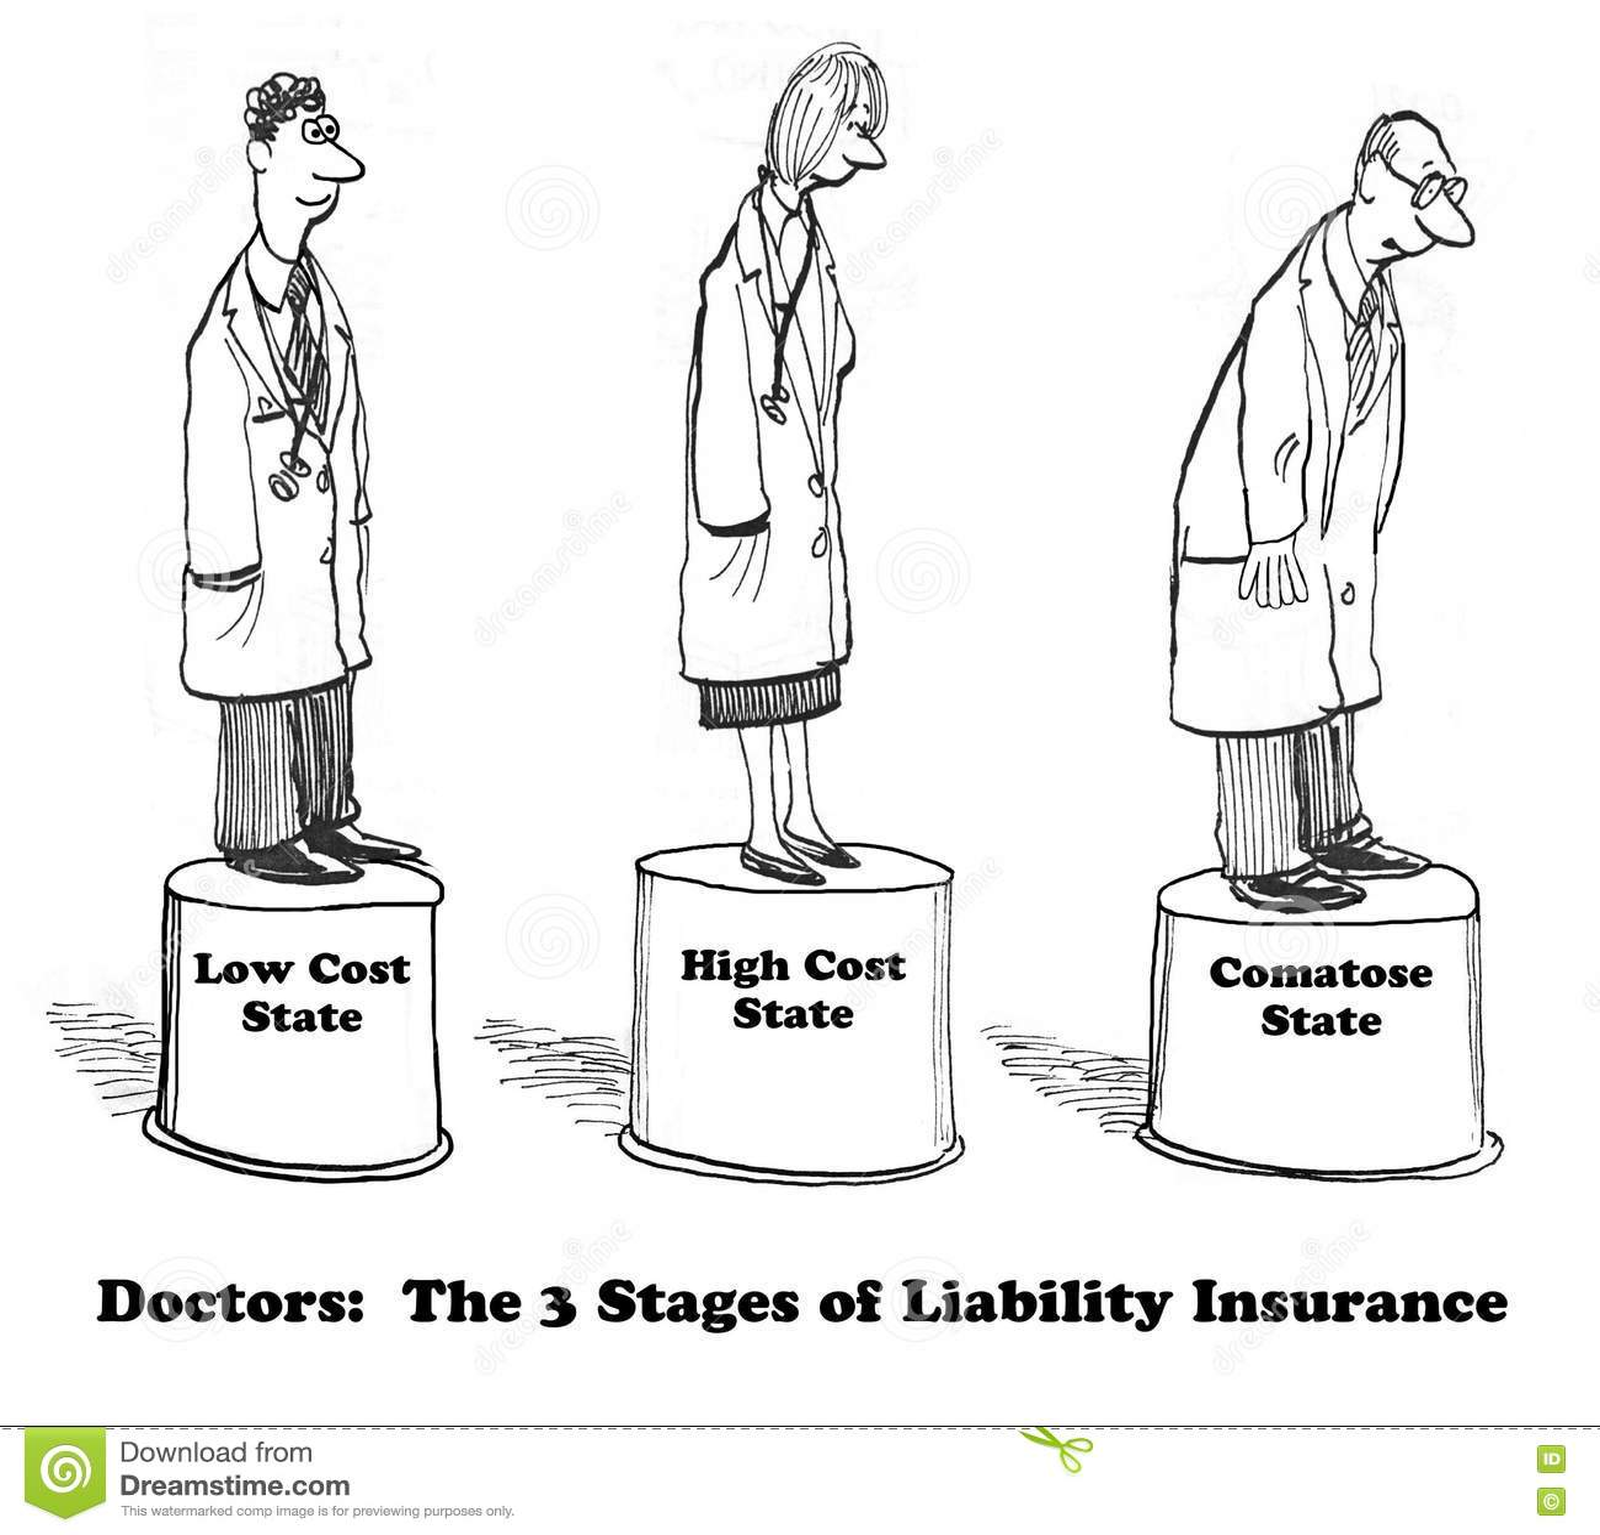 Malpractice Cartoons Illustrations Amp Vector Stock Images